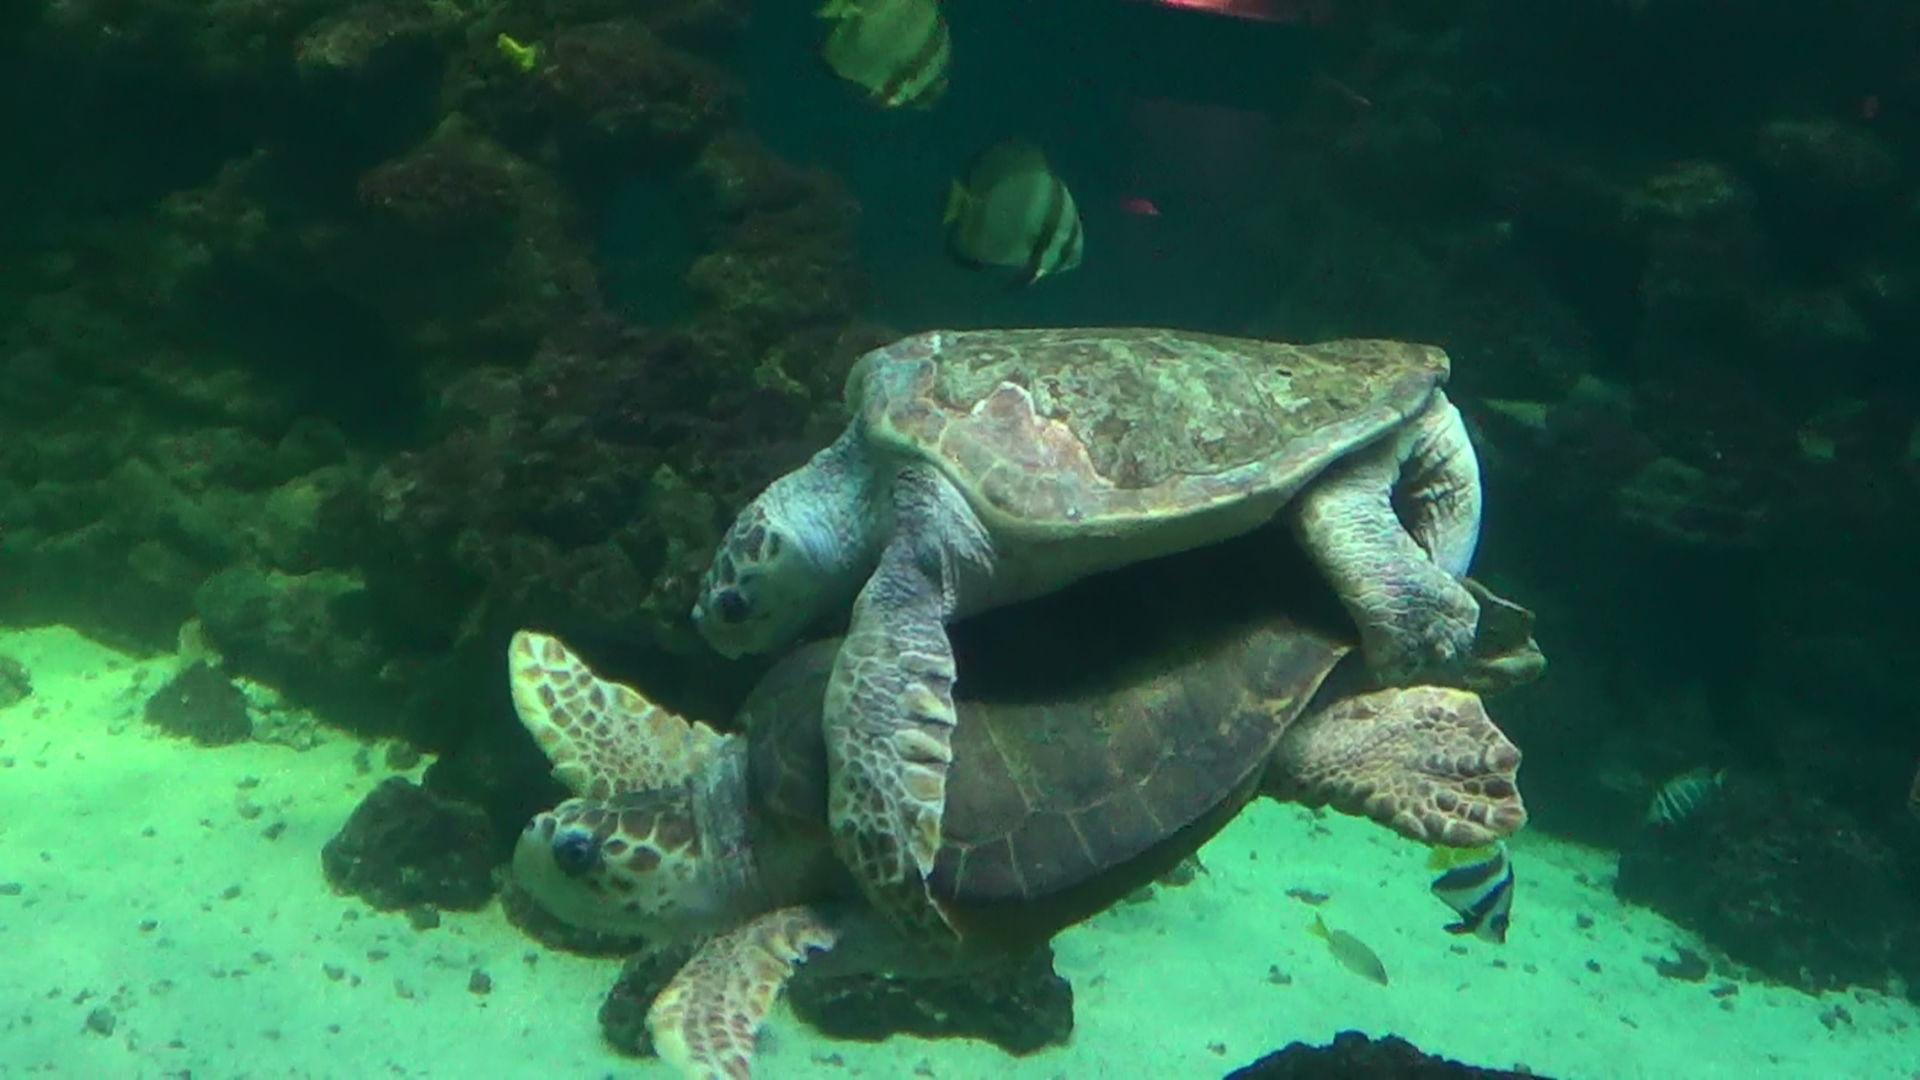 Paarung Carettschildkröte (1)